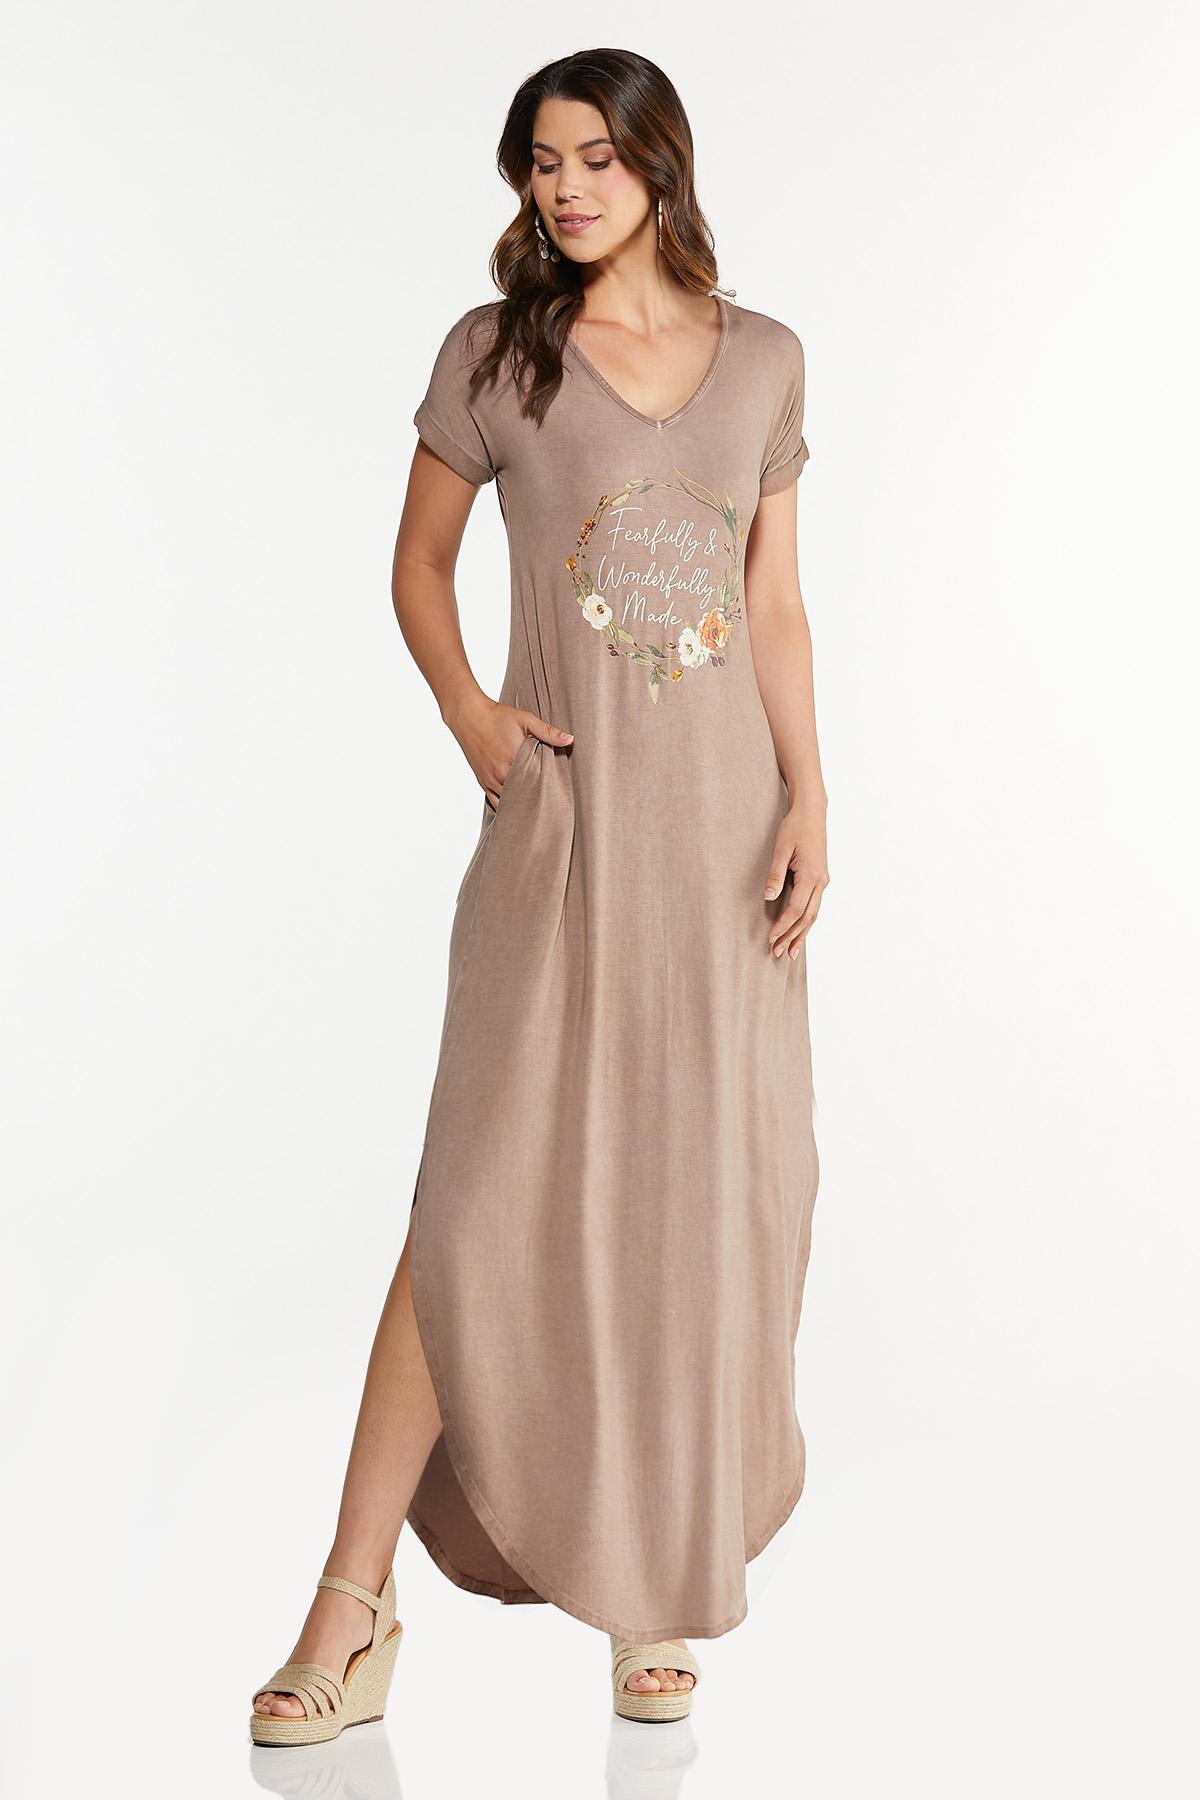 Plus Size Inspirational Shirt Maxi Dress